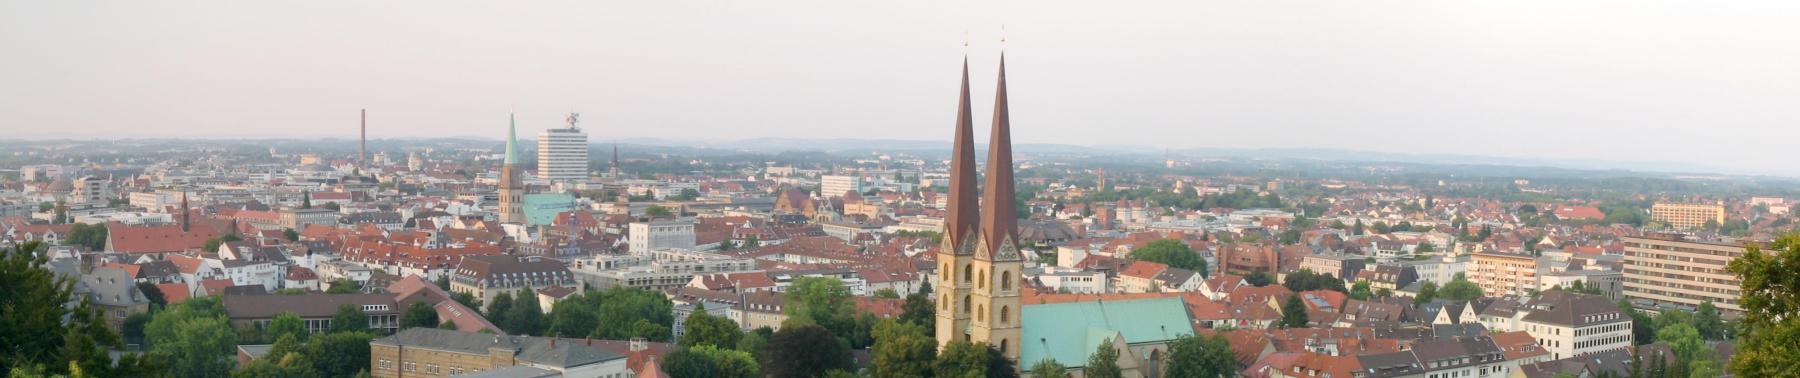 Der Beweis: Bielefeld existiert doch. (Foto: fab/Wikipedia CC BY-SA 3.0)